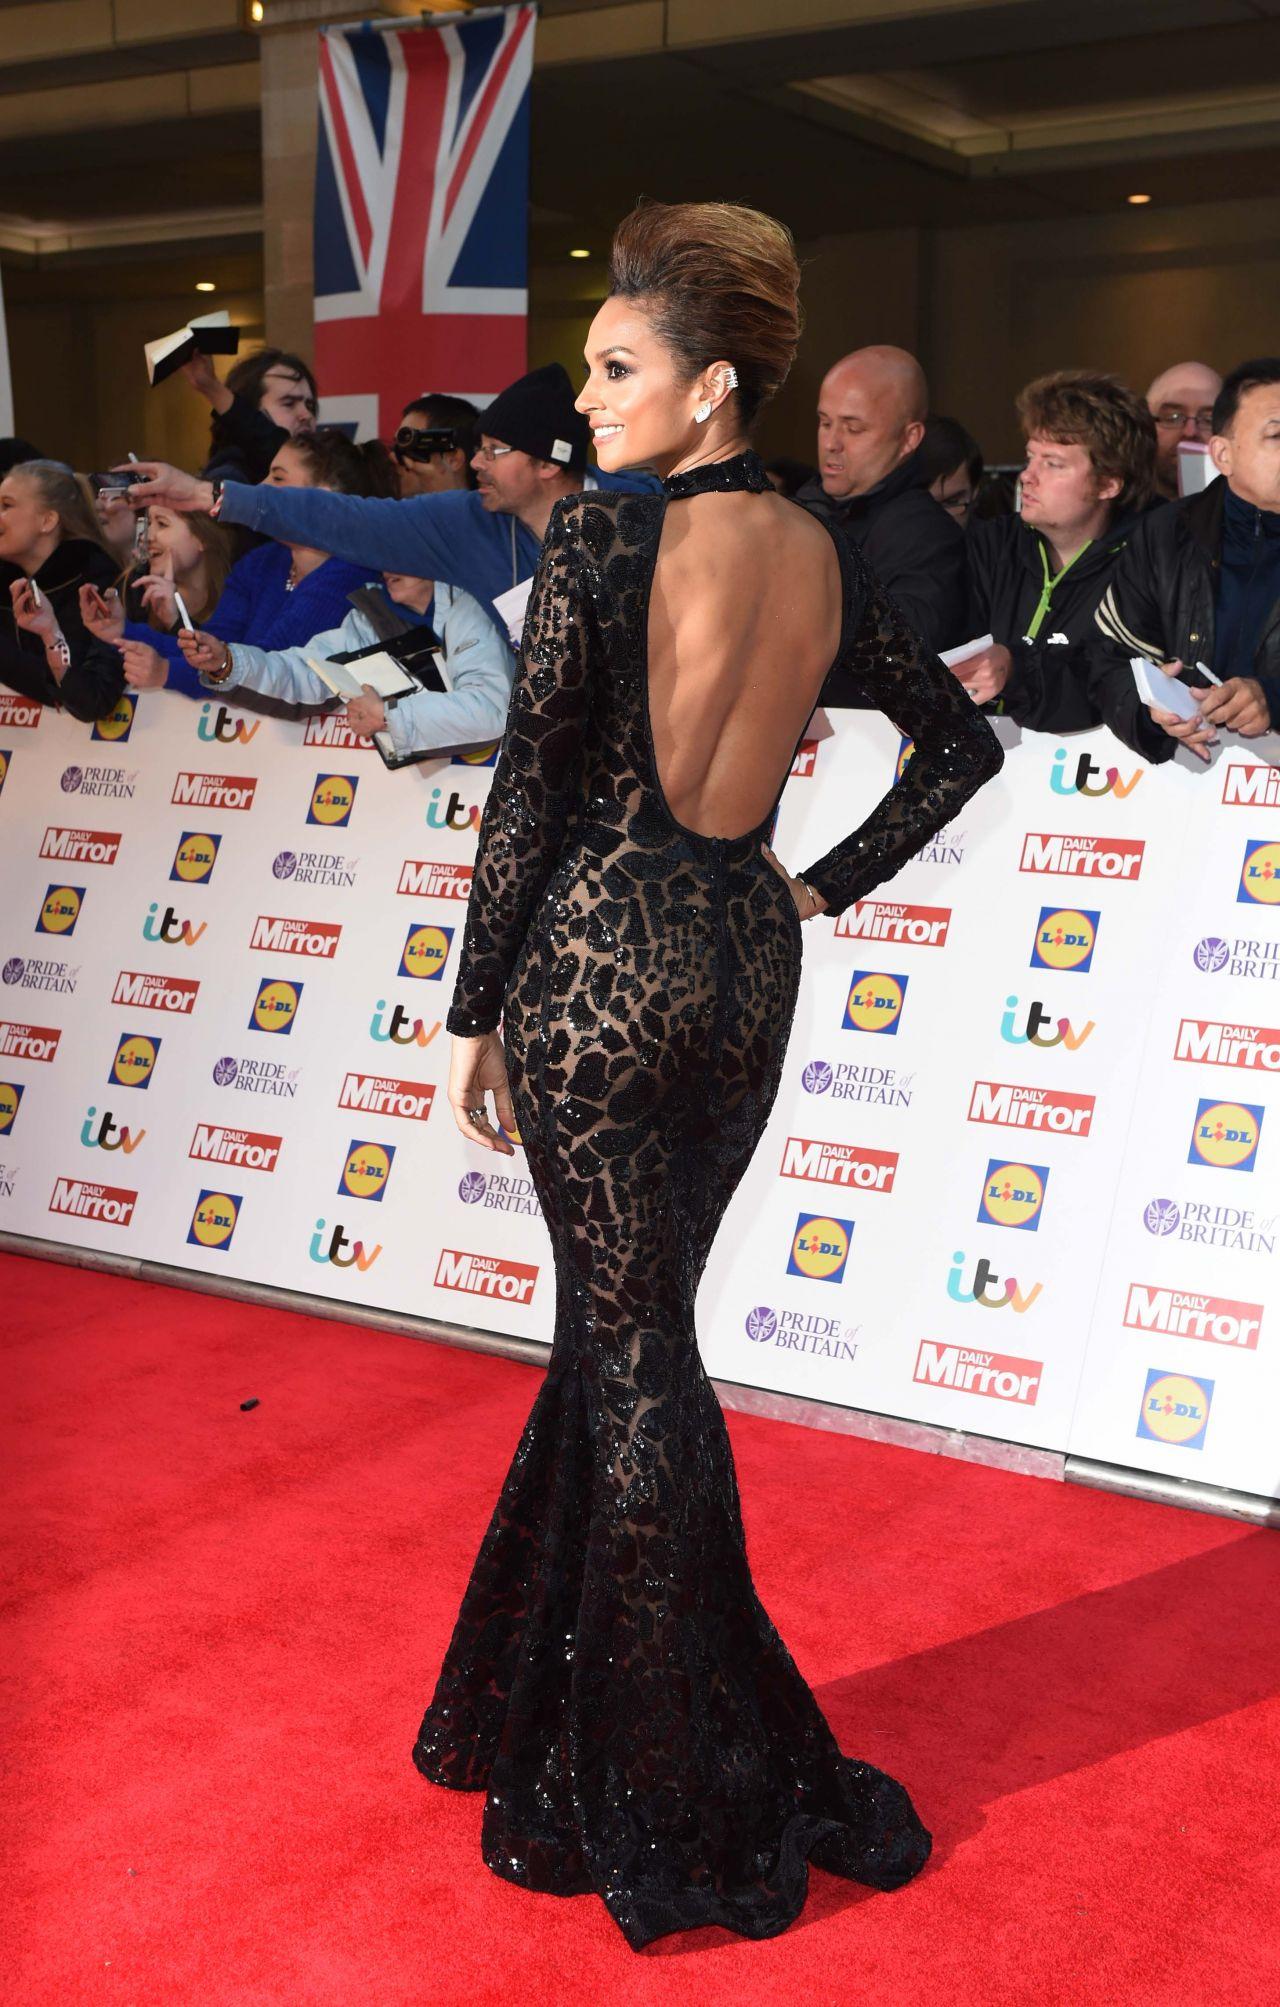 alesha-dixon-pride-of-britain-awards-2015-in-london_3